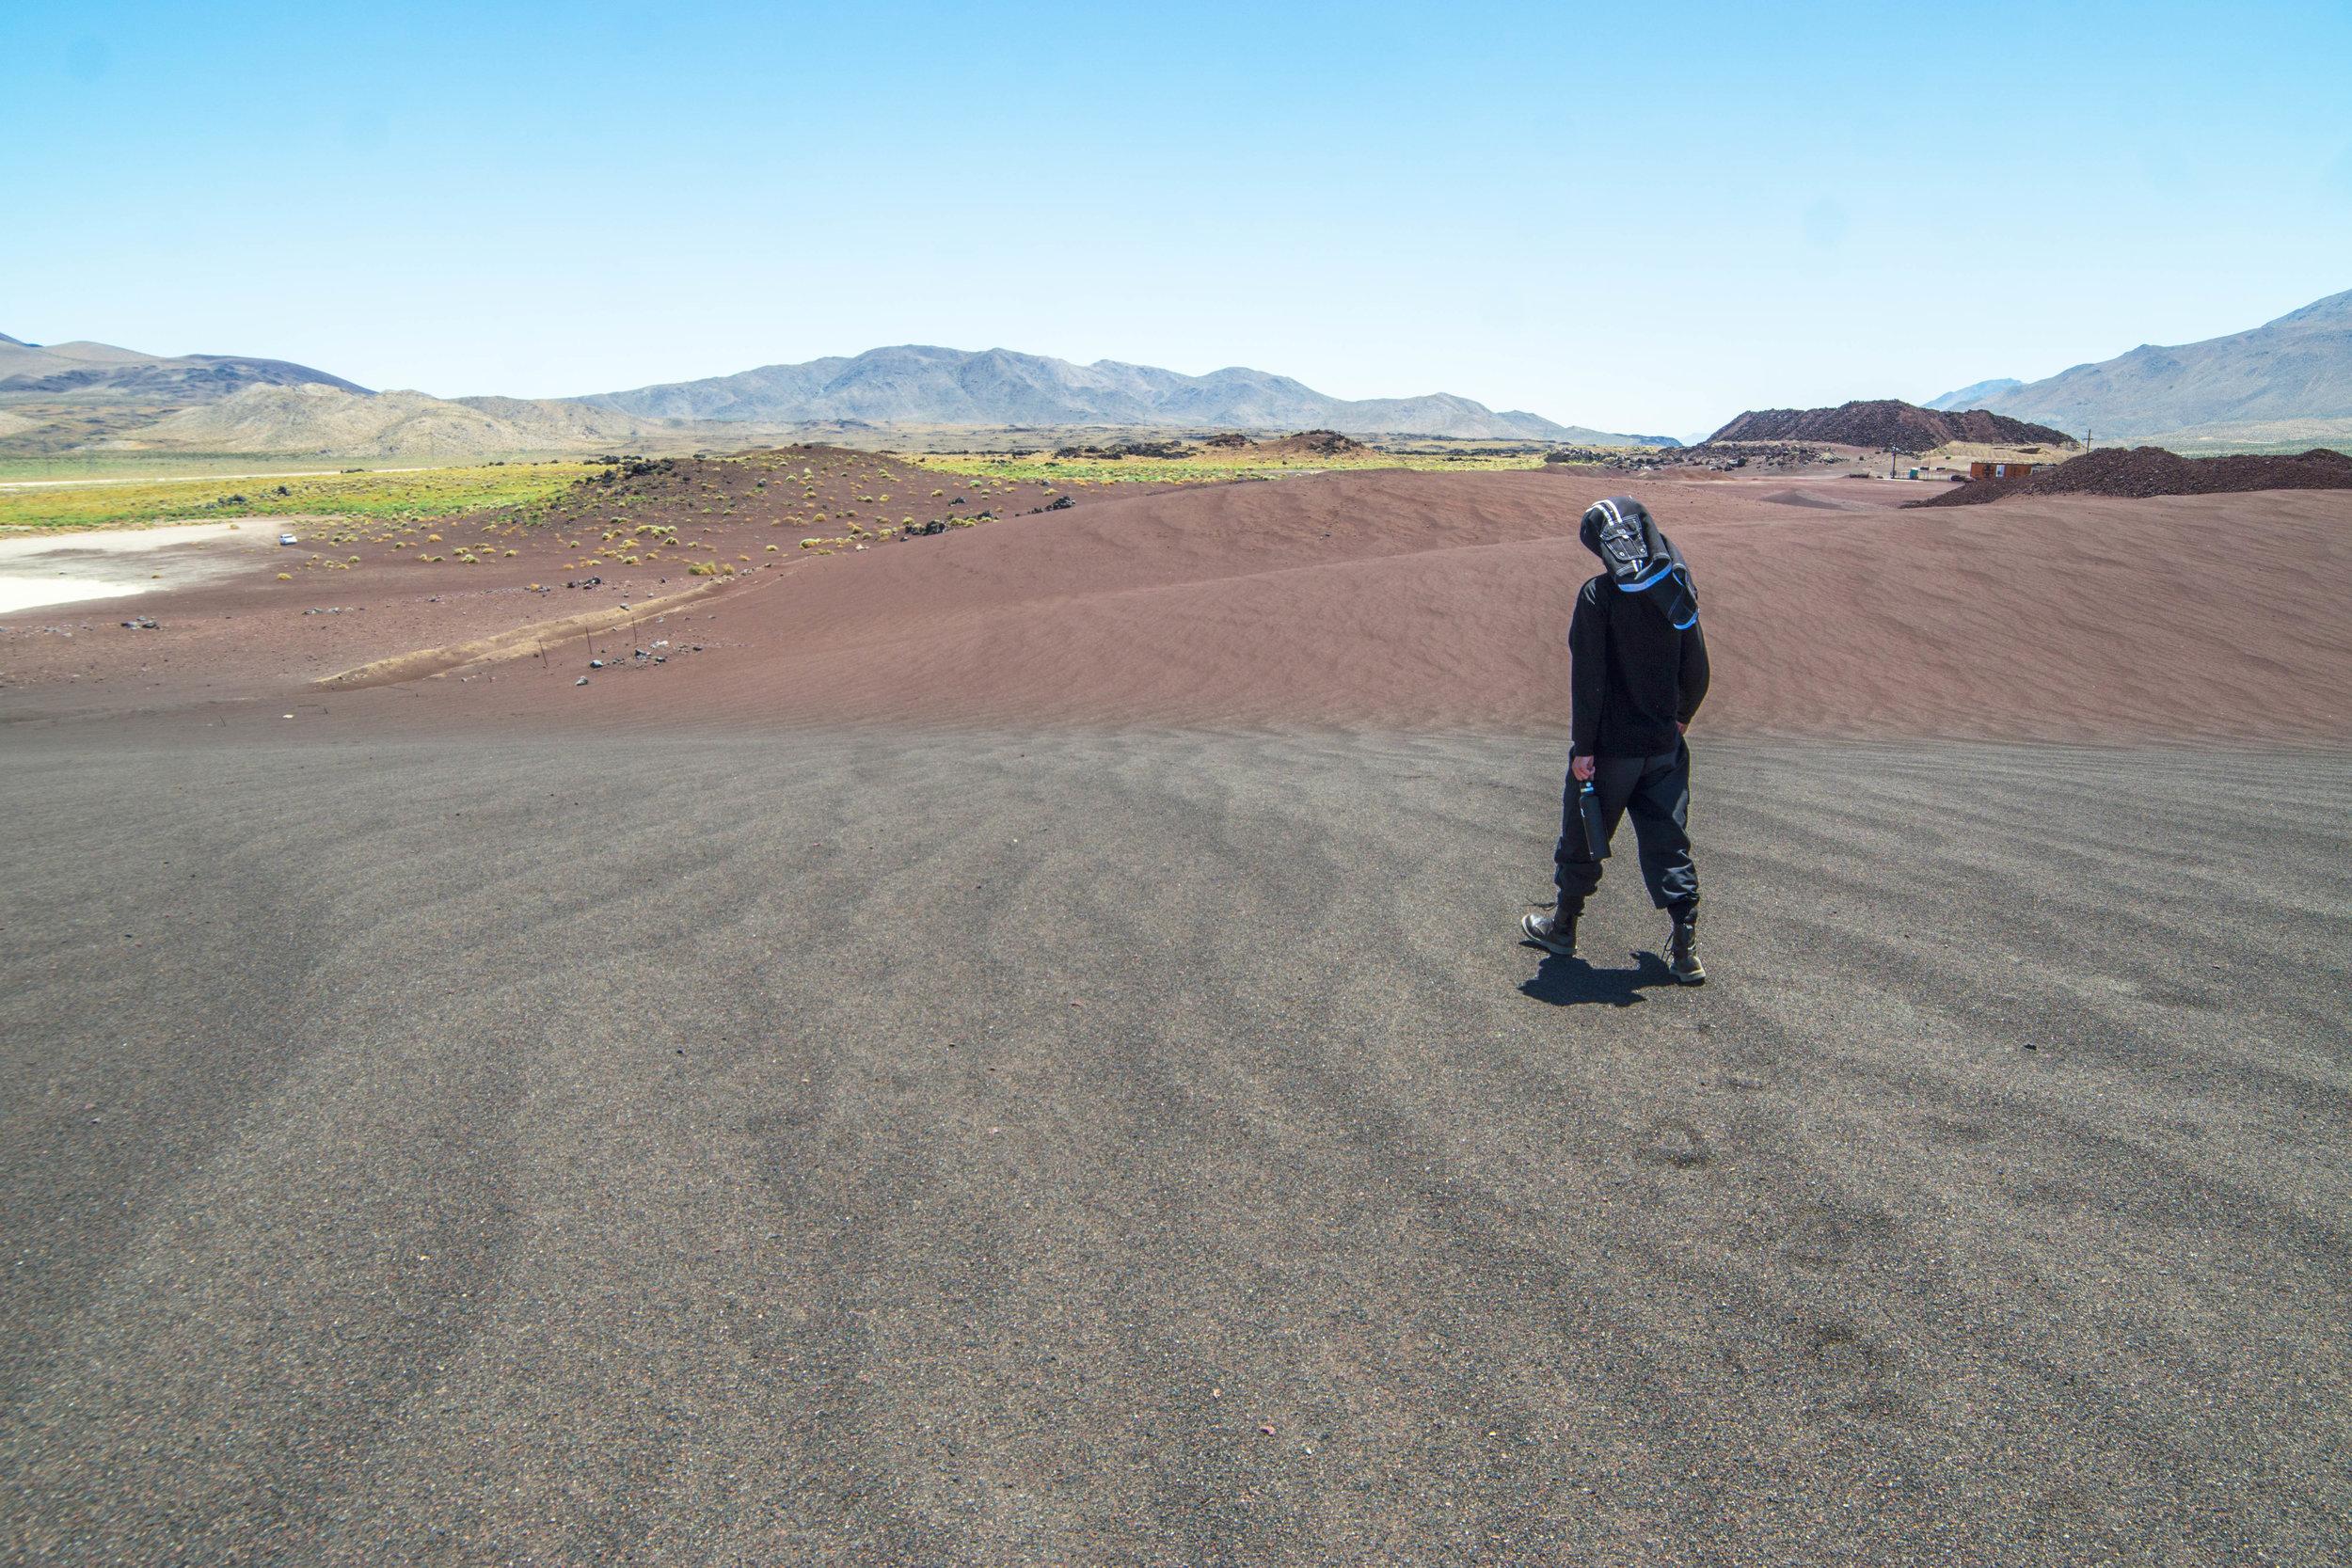 Like an alien planet, it has mars red & black sand dunes.